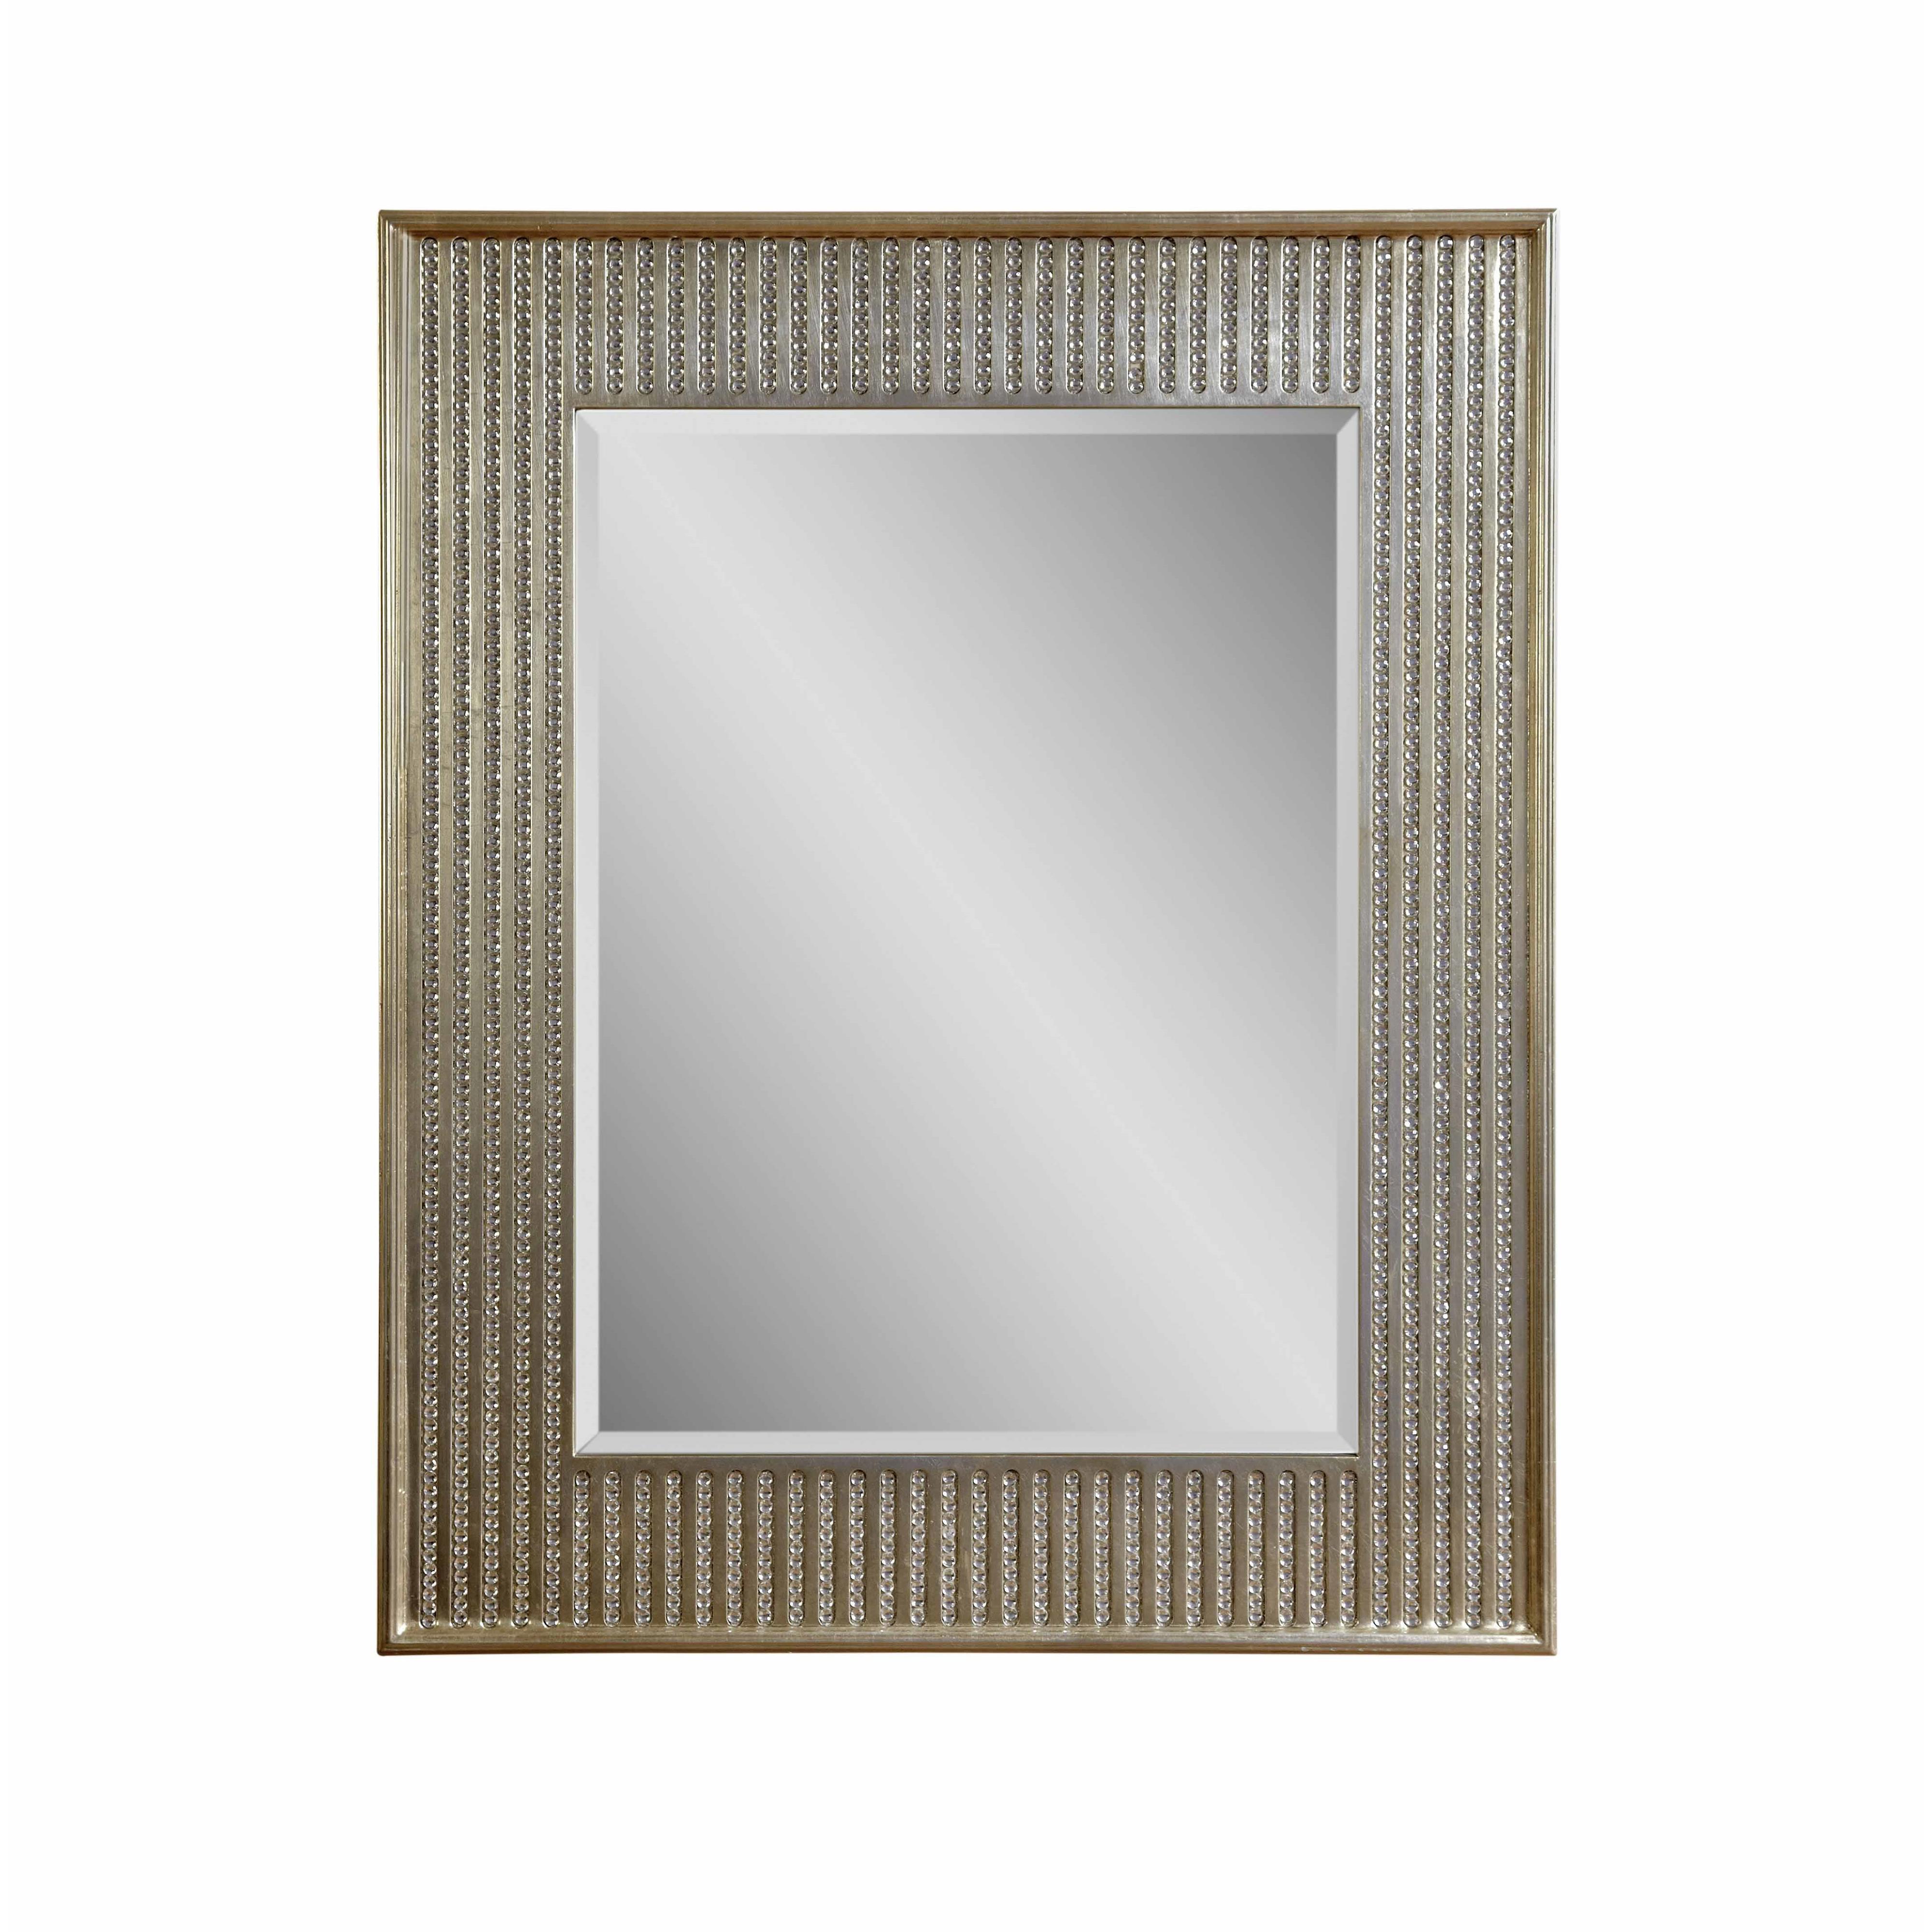 Bling Wall Mirror